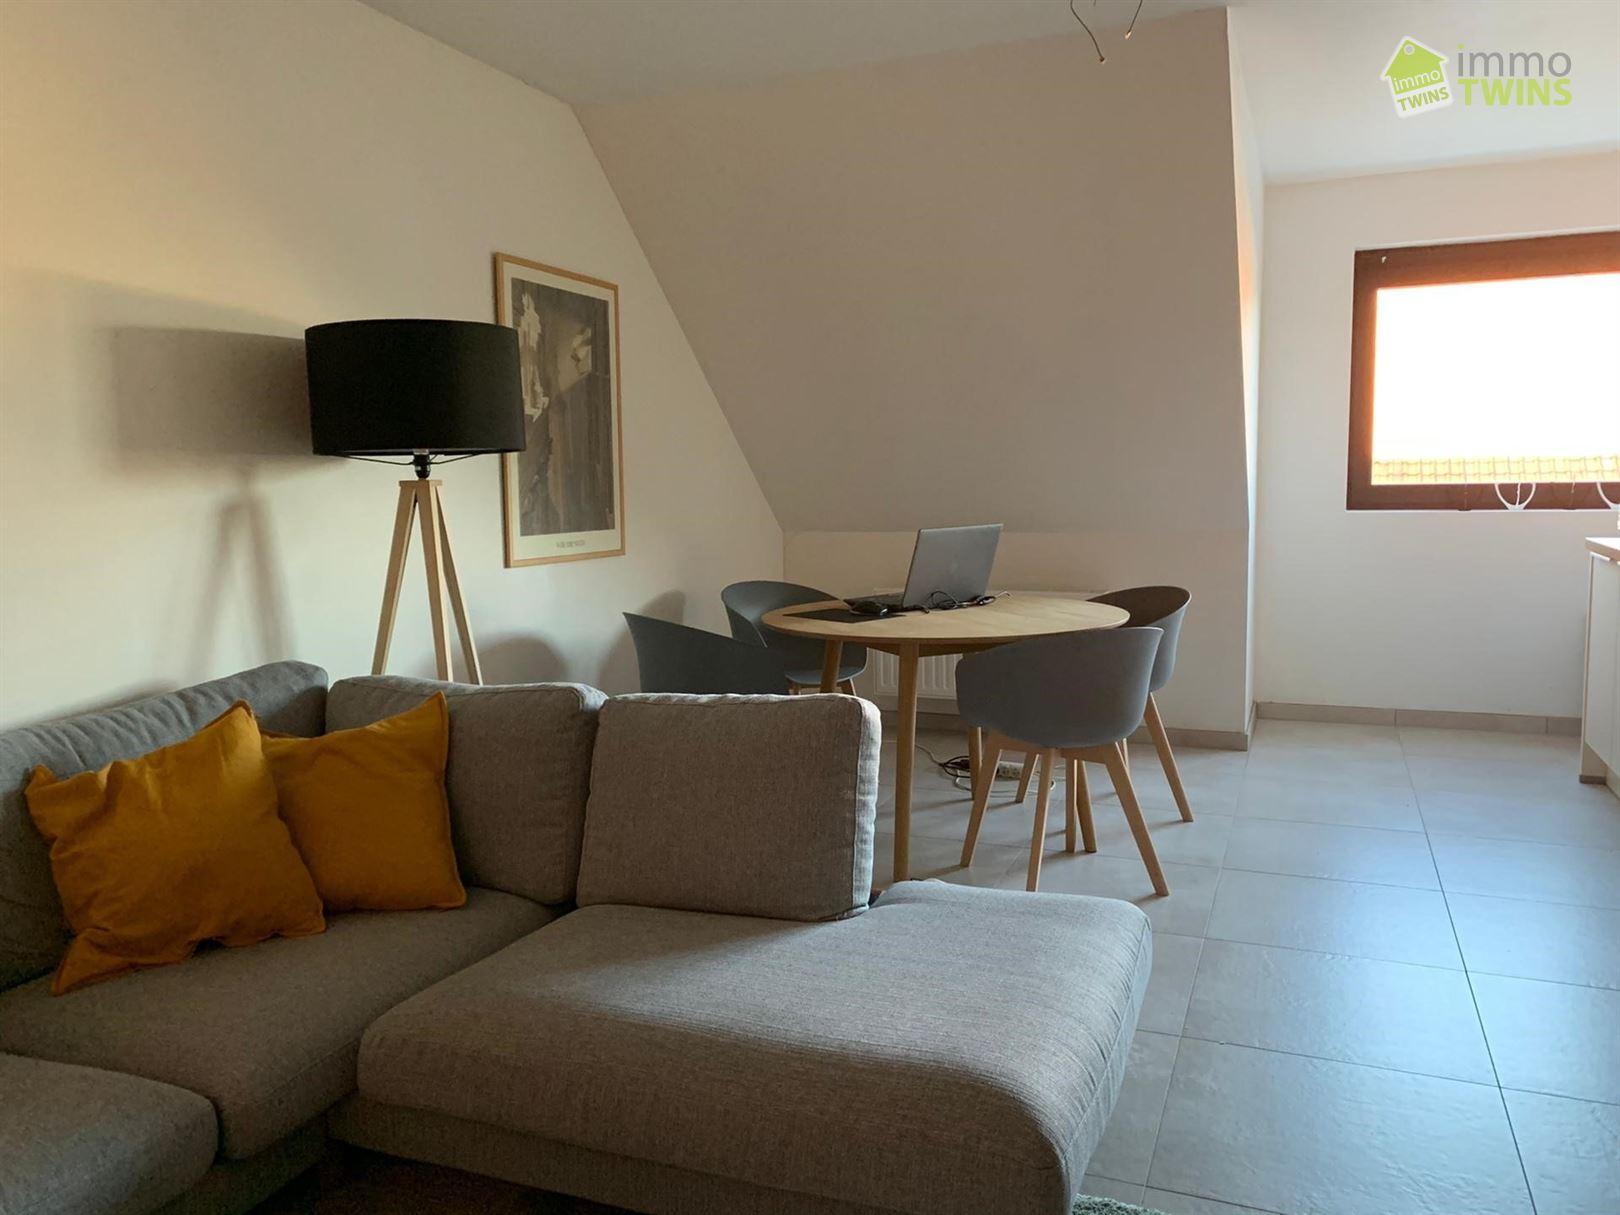 Foto 19 : Appartement te 9200 BAASRODE (België) - Prijs € 660